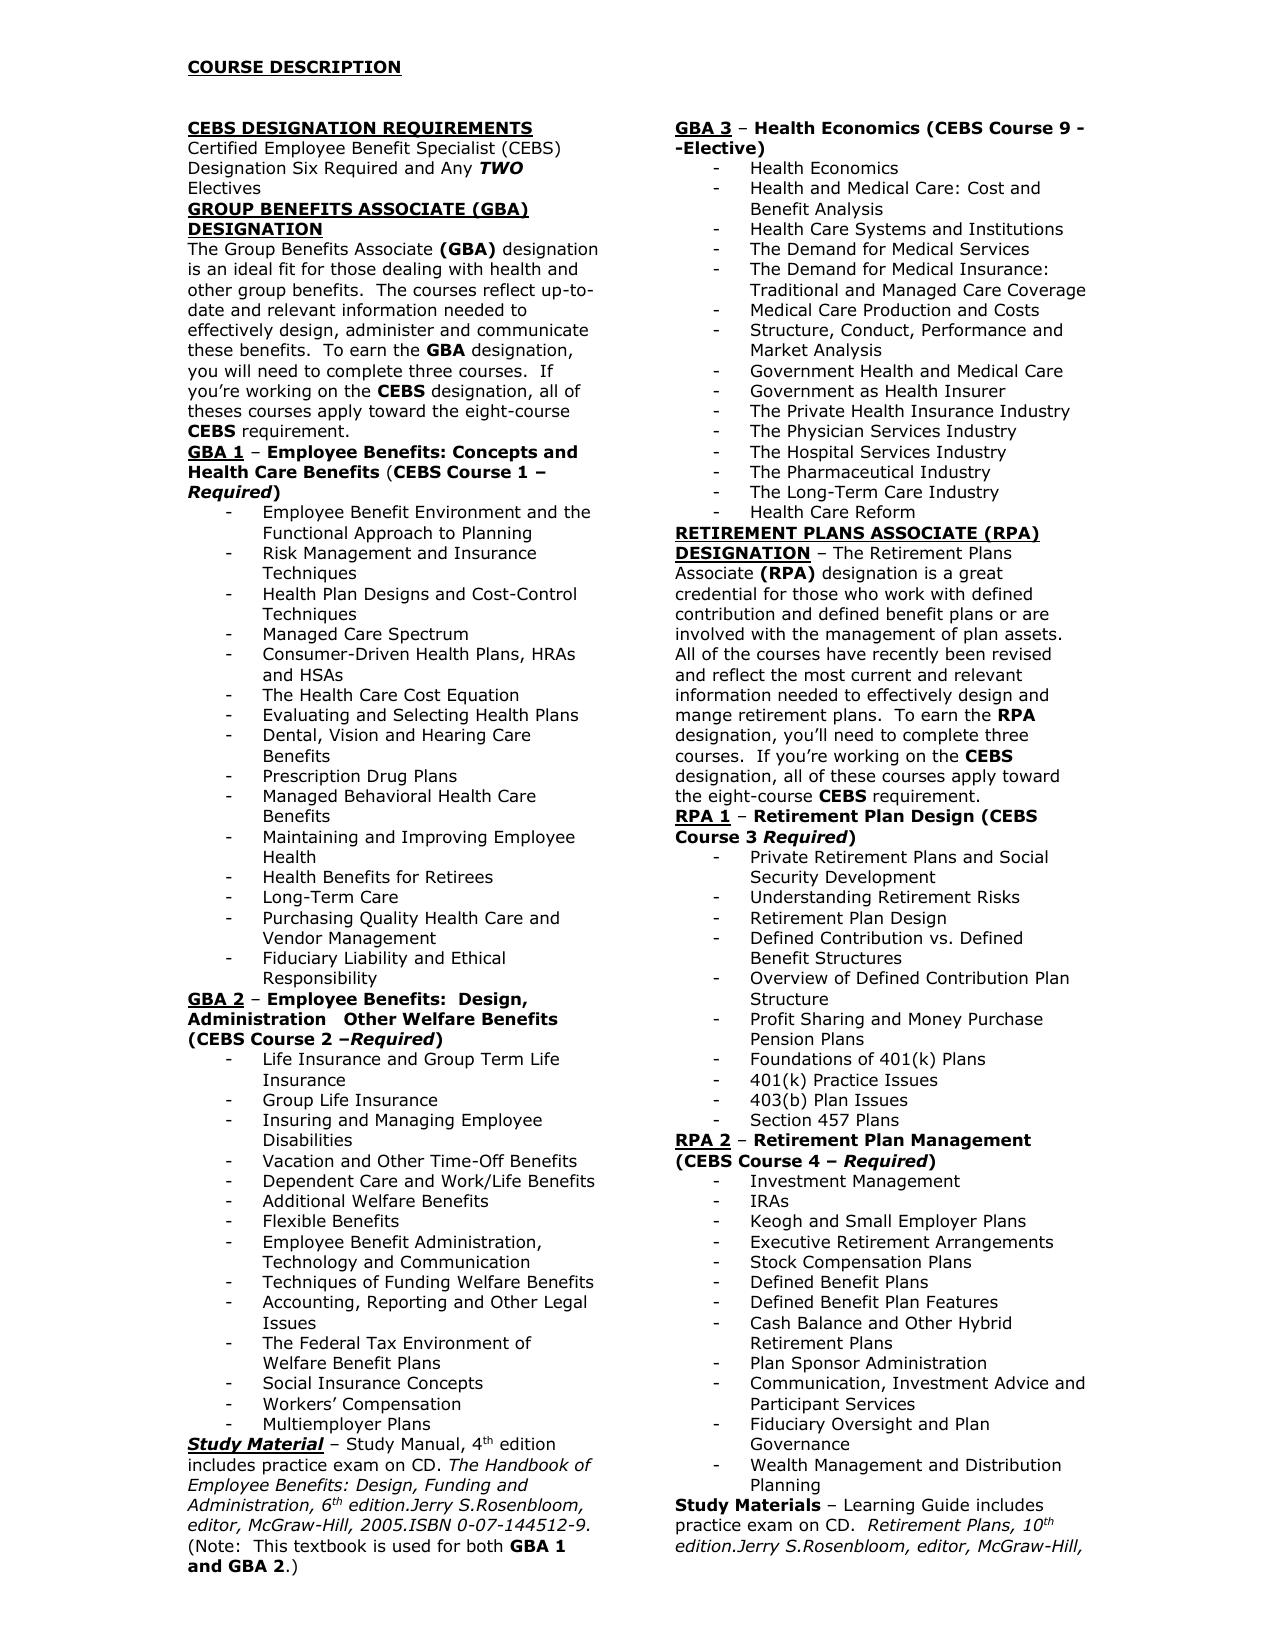 Cebs Designation Requirements